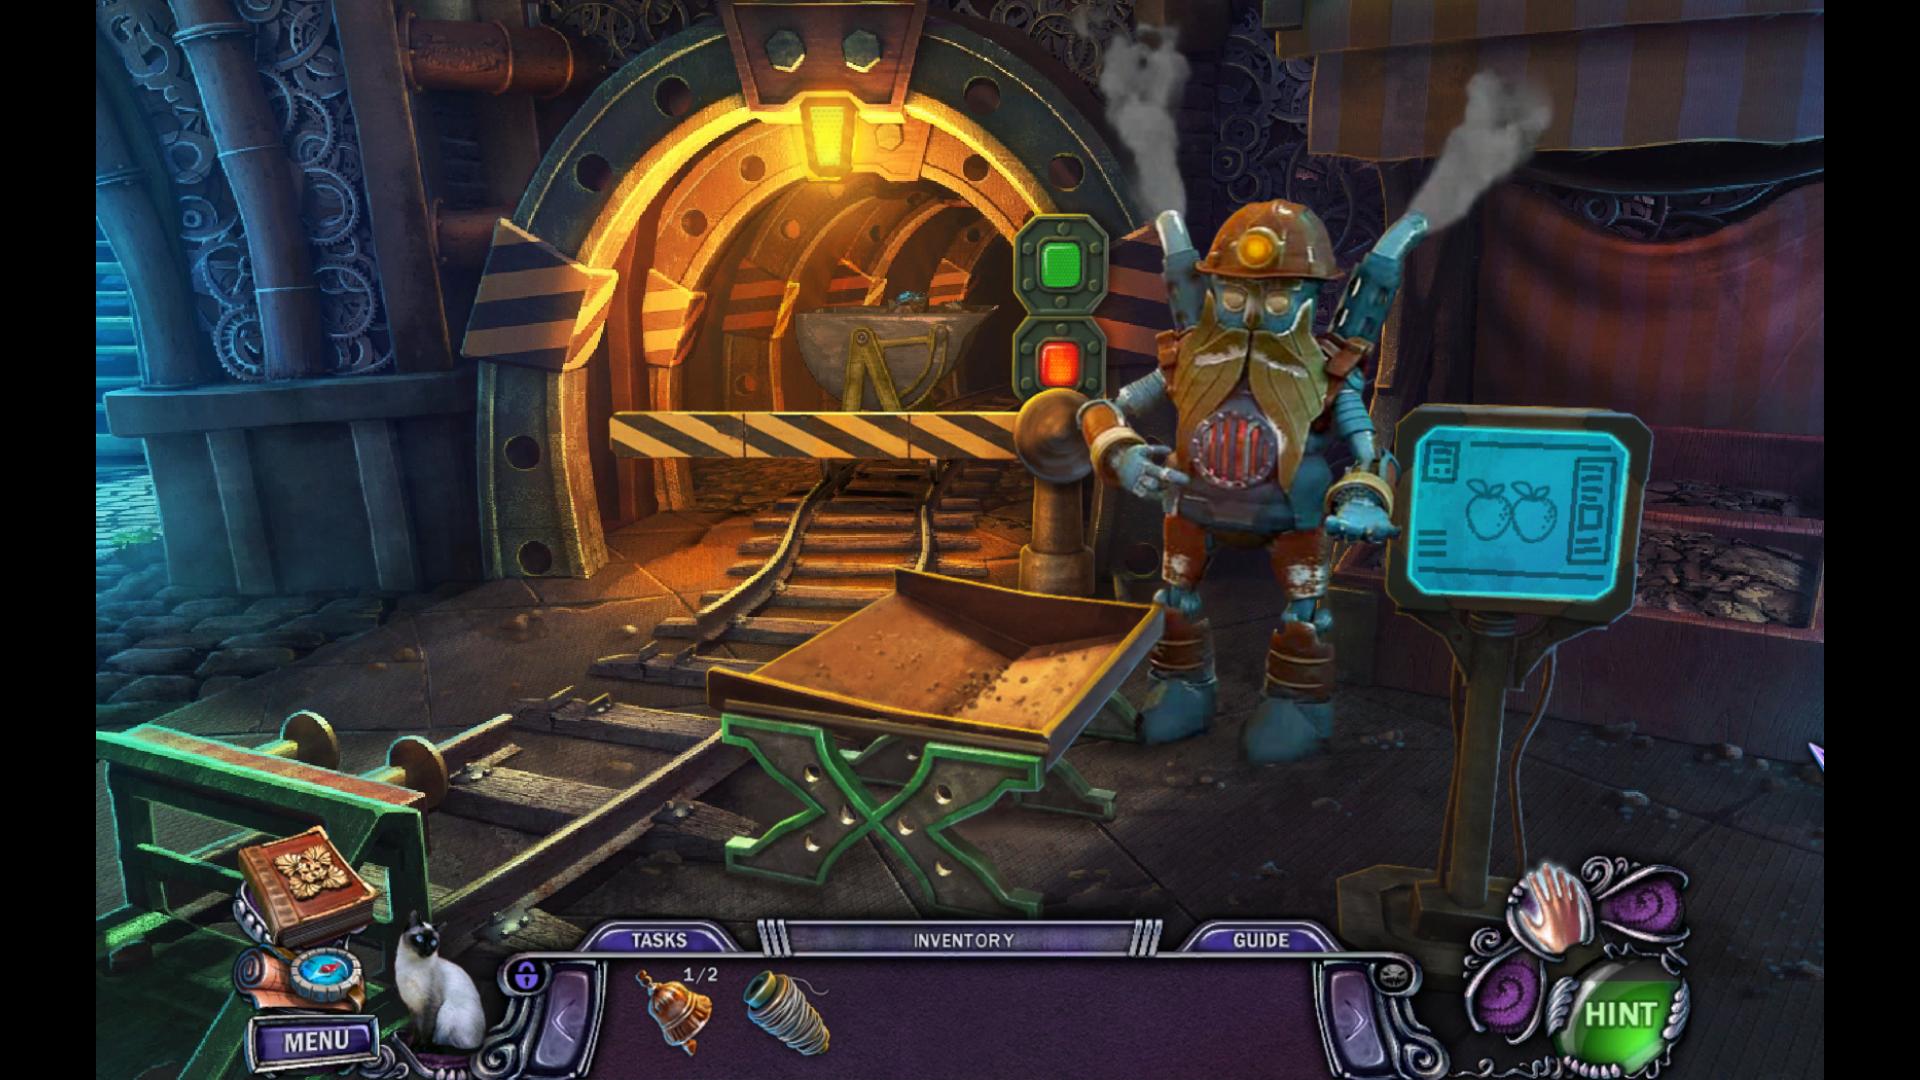 Screenshot from House of 1000 Doors: Evil Inside (2/9)